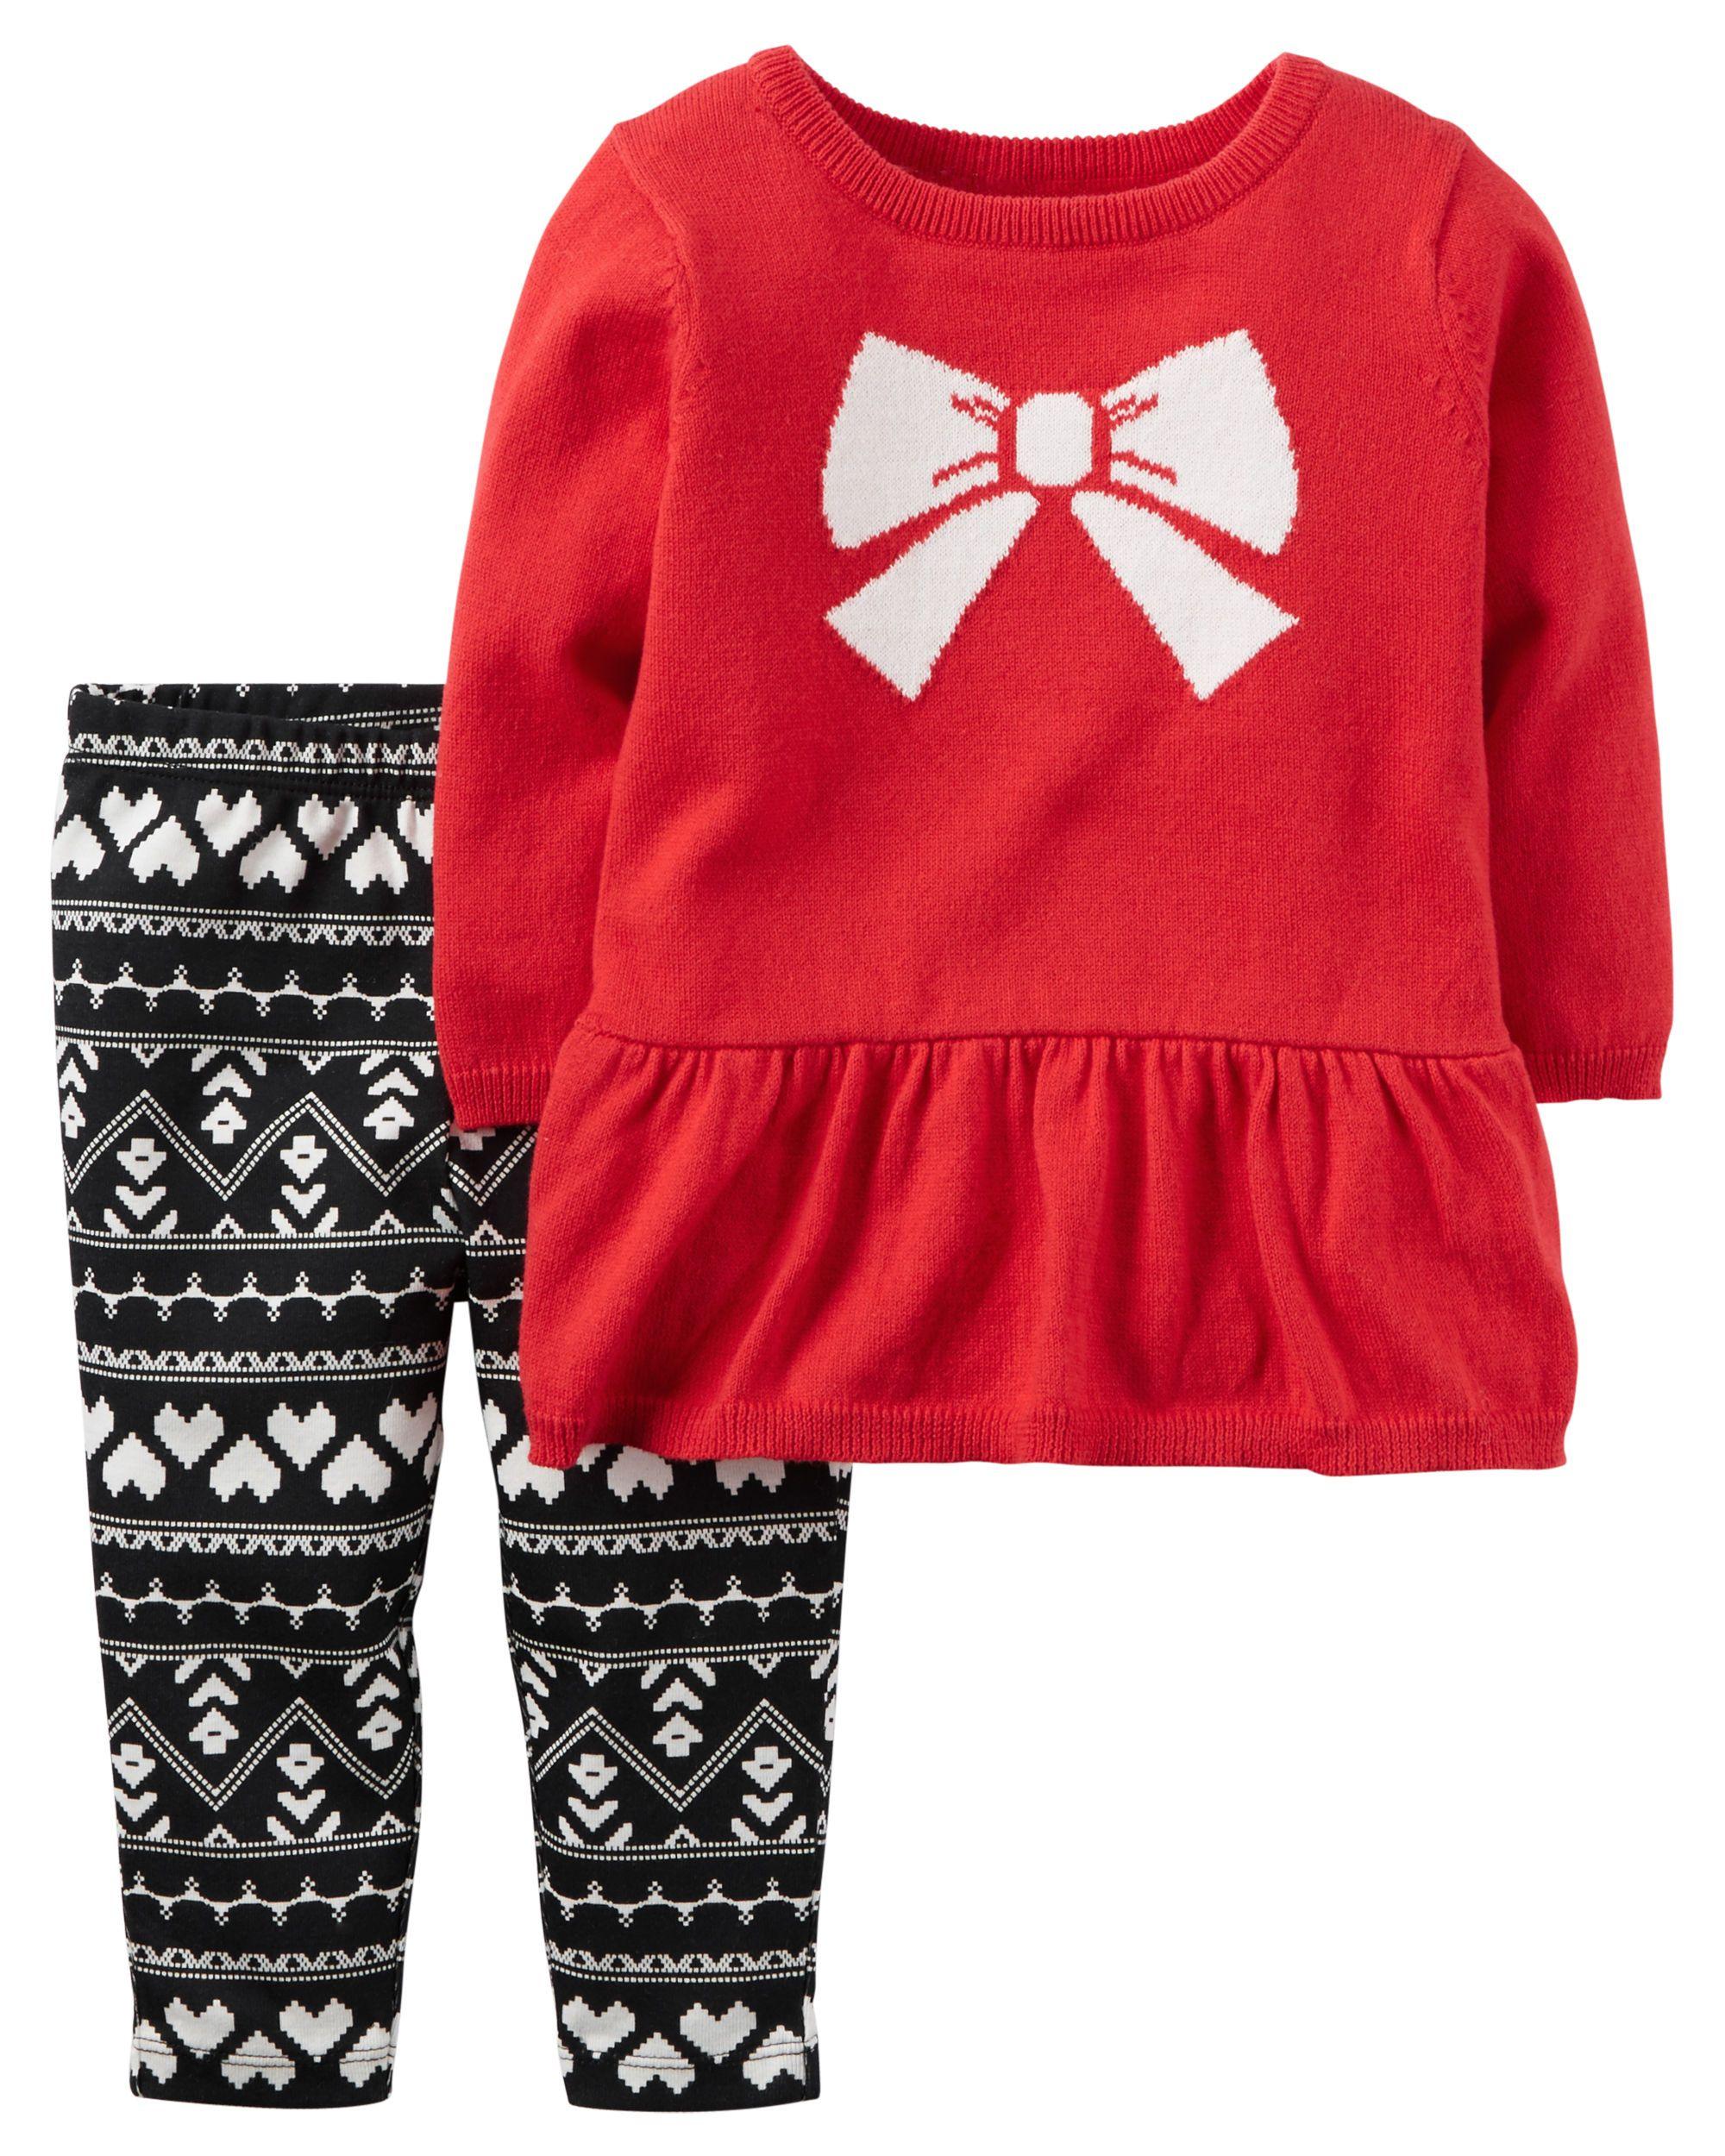 2 Piece Little Sweater Set Baby Stuff Baby Carters Baby Girl